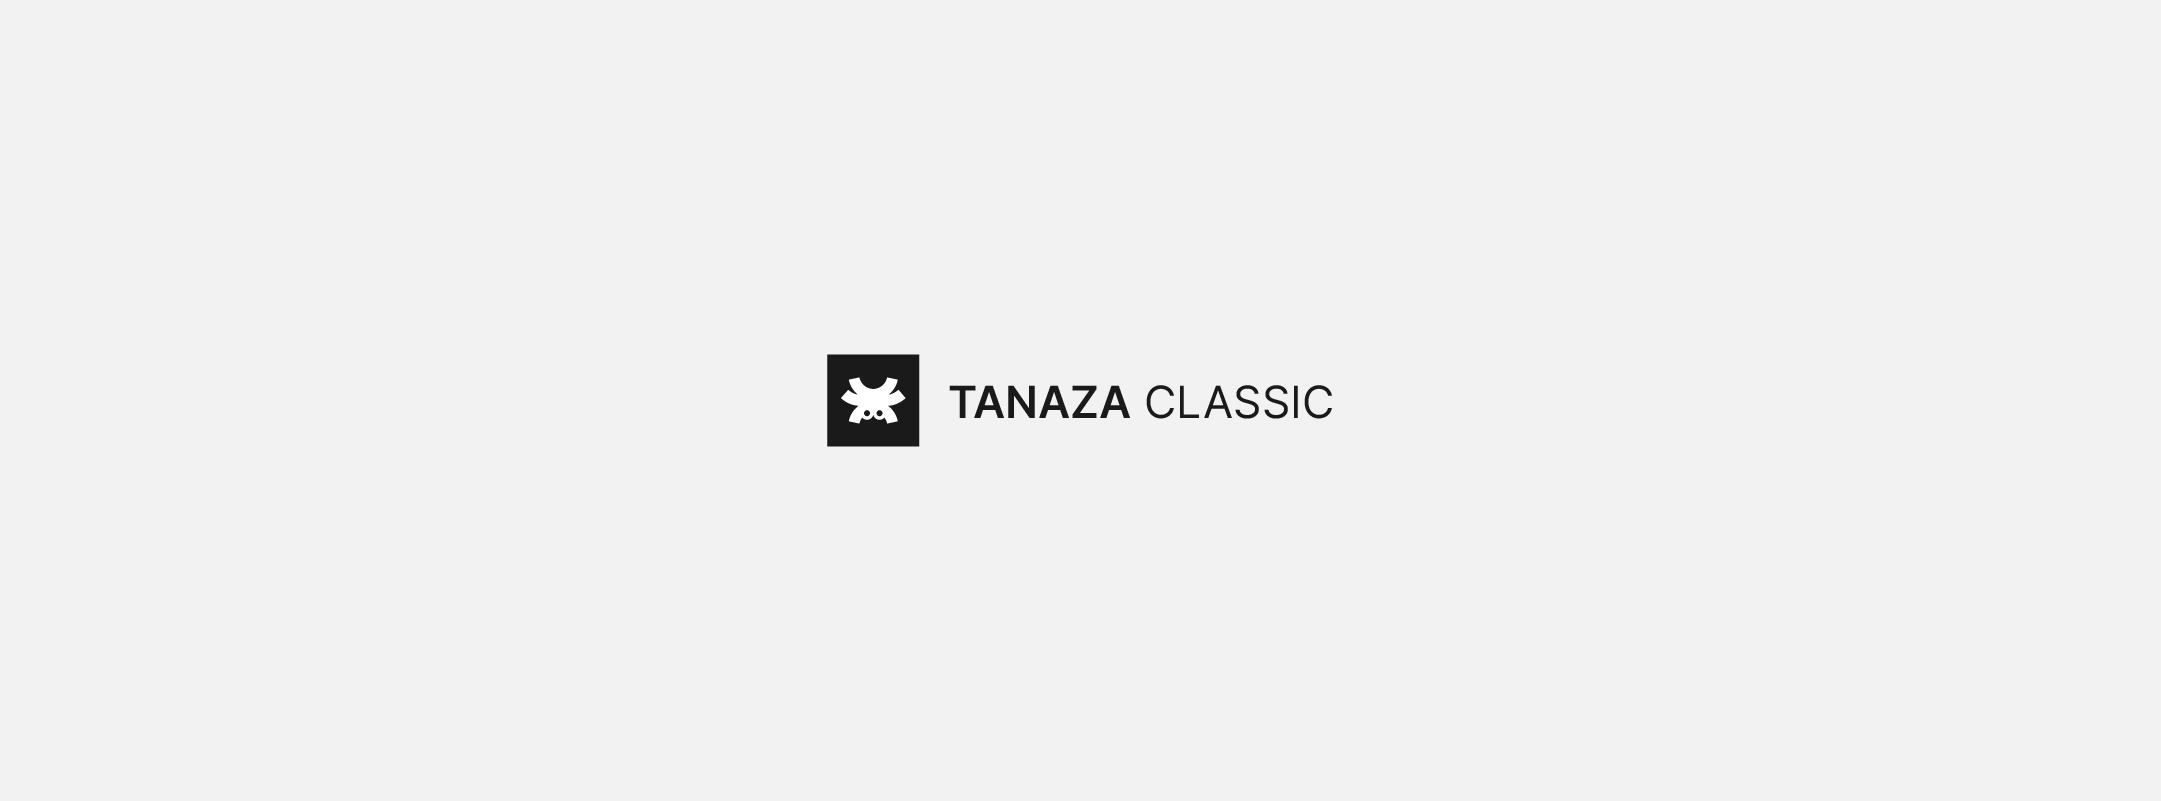 Tanaza Classic